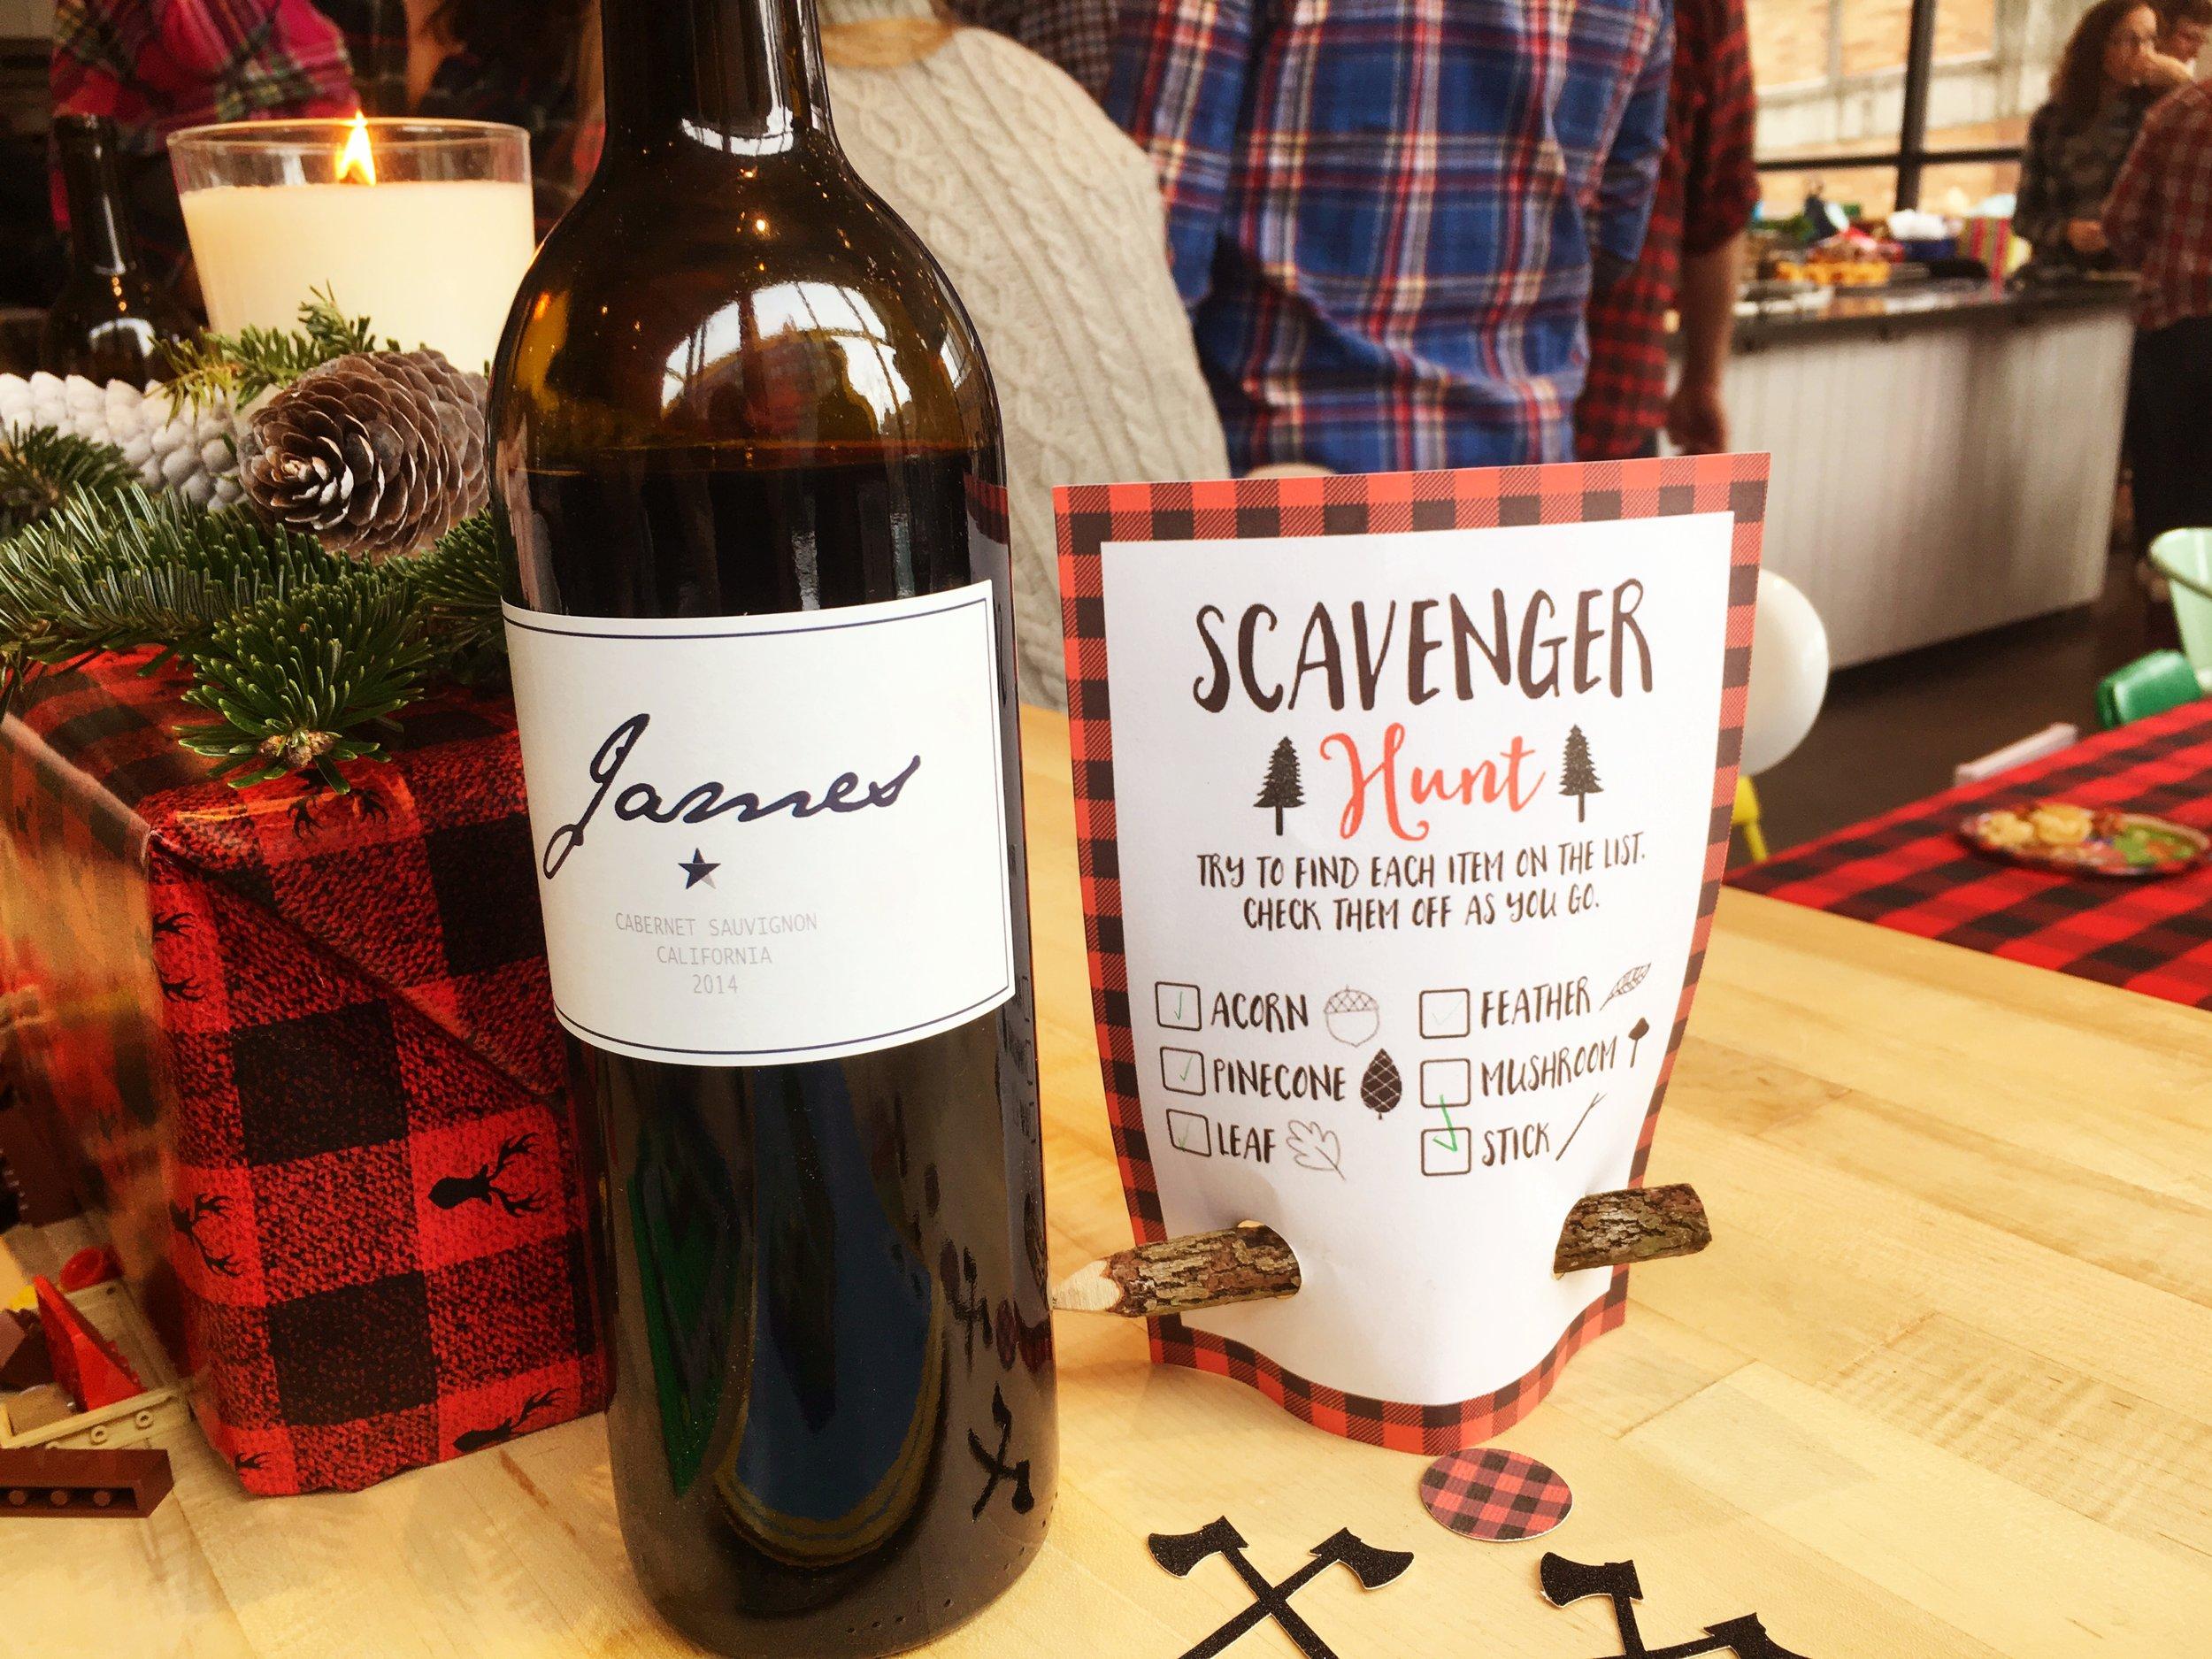 Scavenger Hunter, James labeled wine and lumberjack confetti